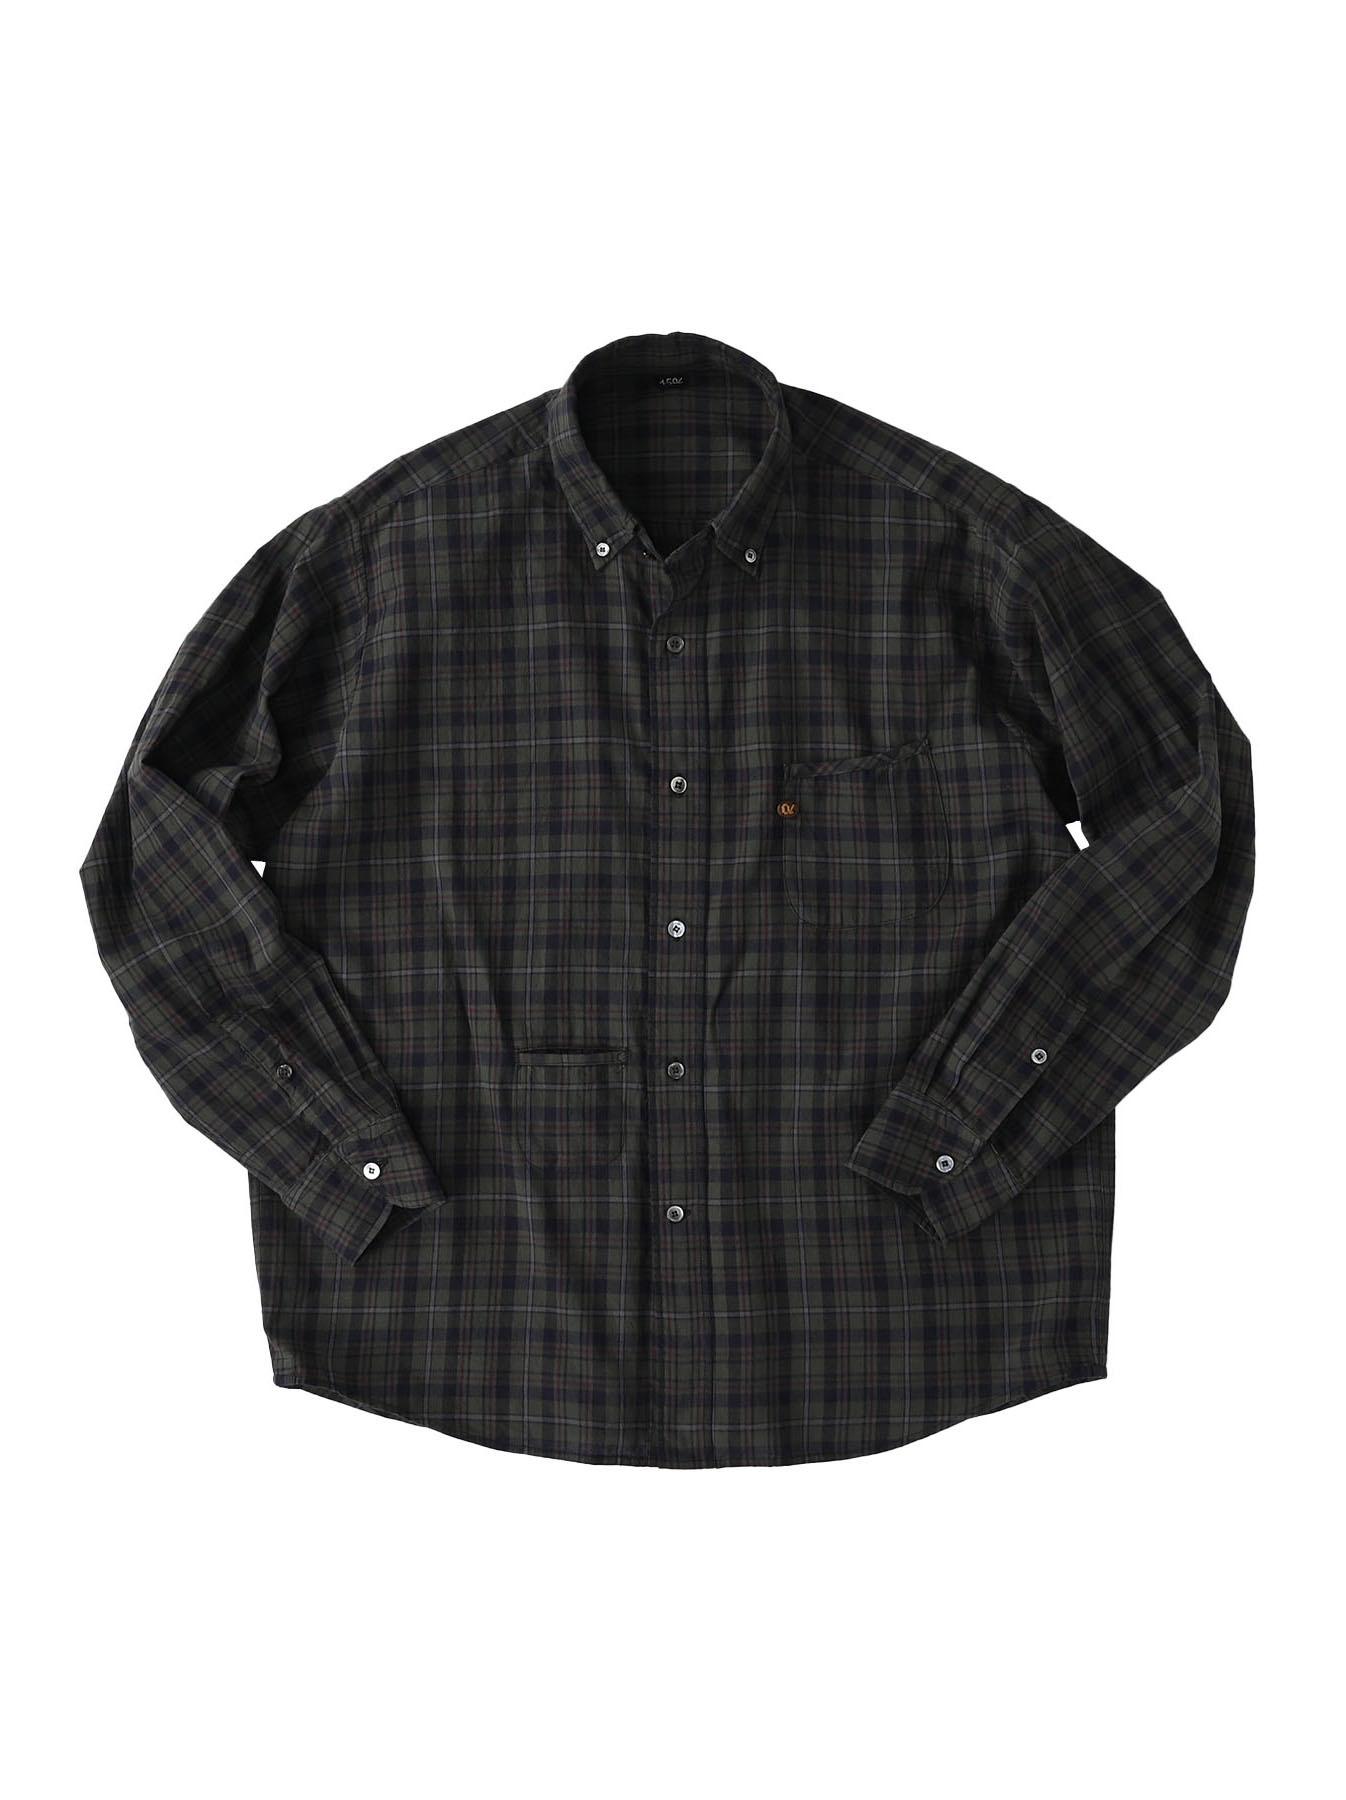 Indian Mugi-hira 908 Ocean Button Down Shirt (0421)-3